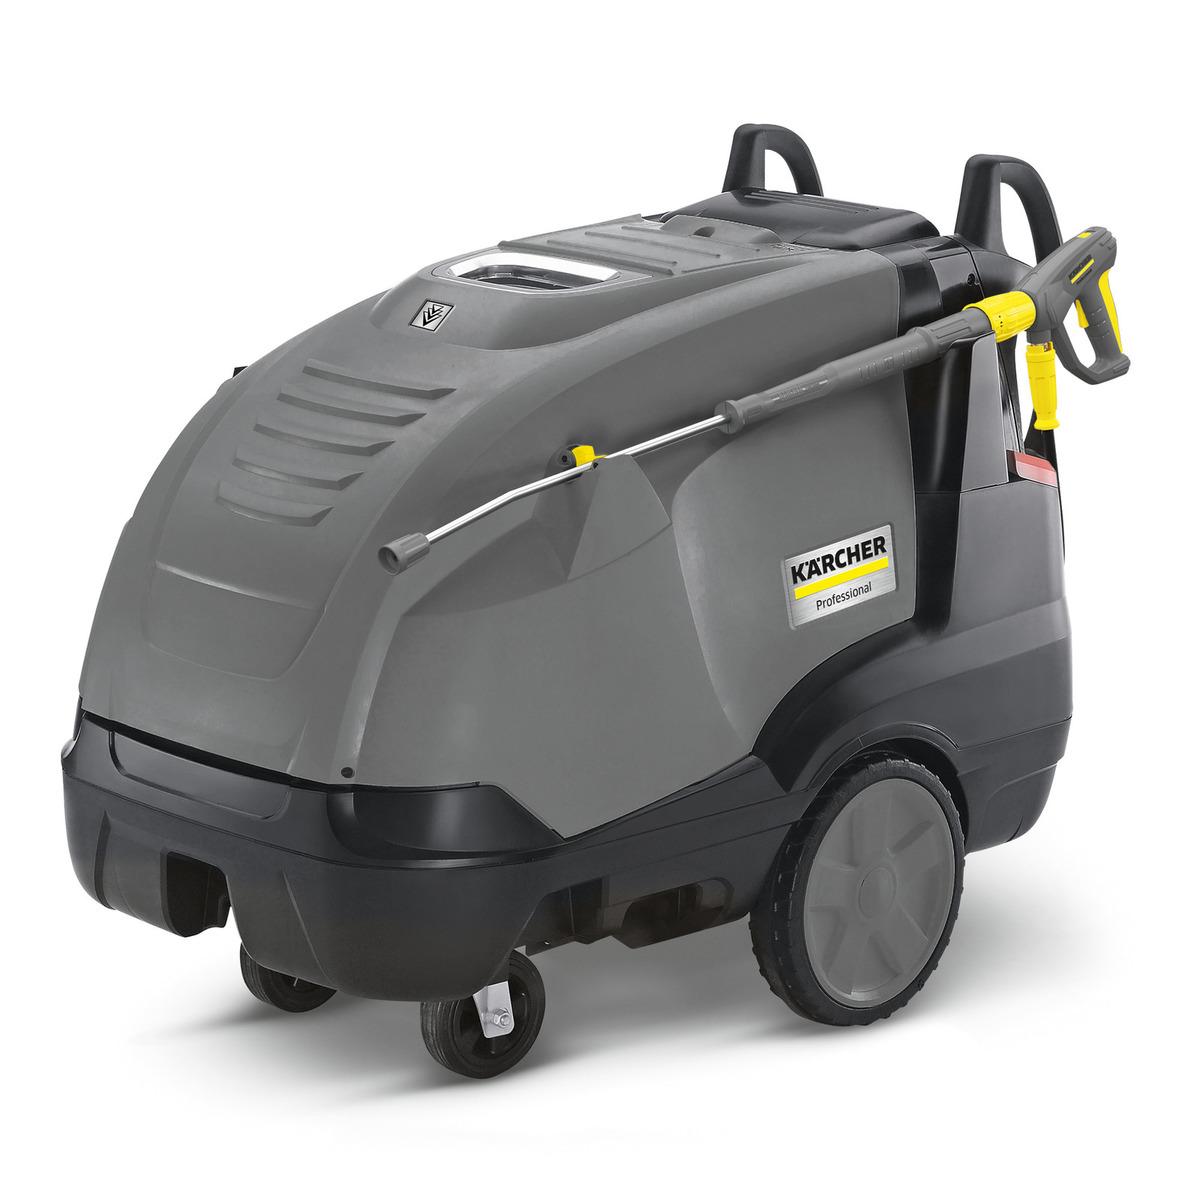 HDS 13/20-4 S热水高压清洗机